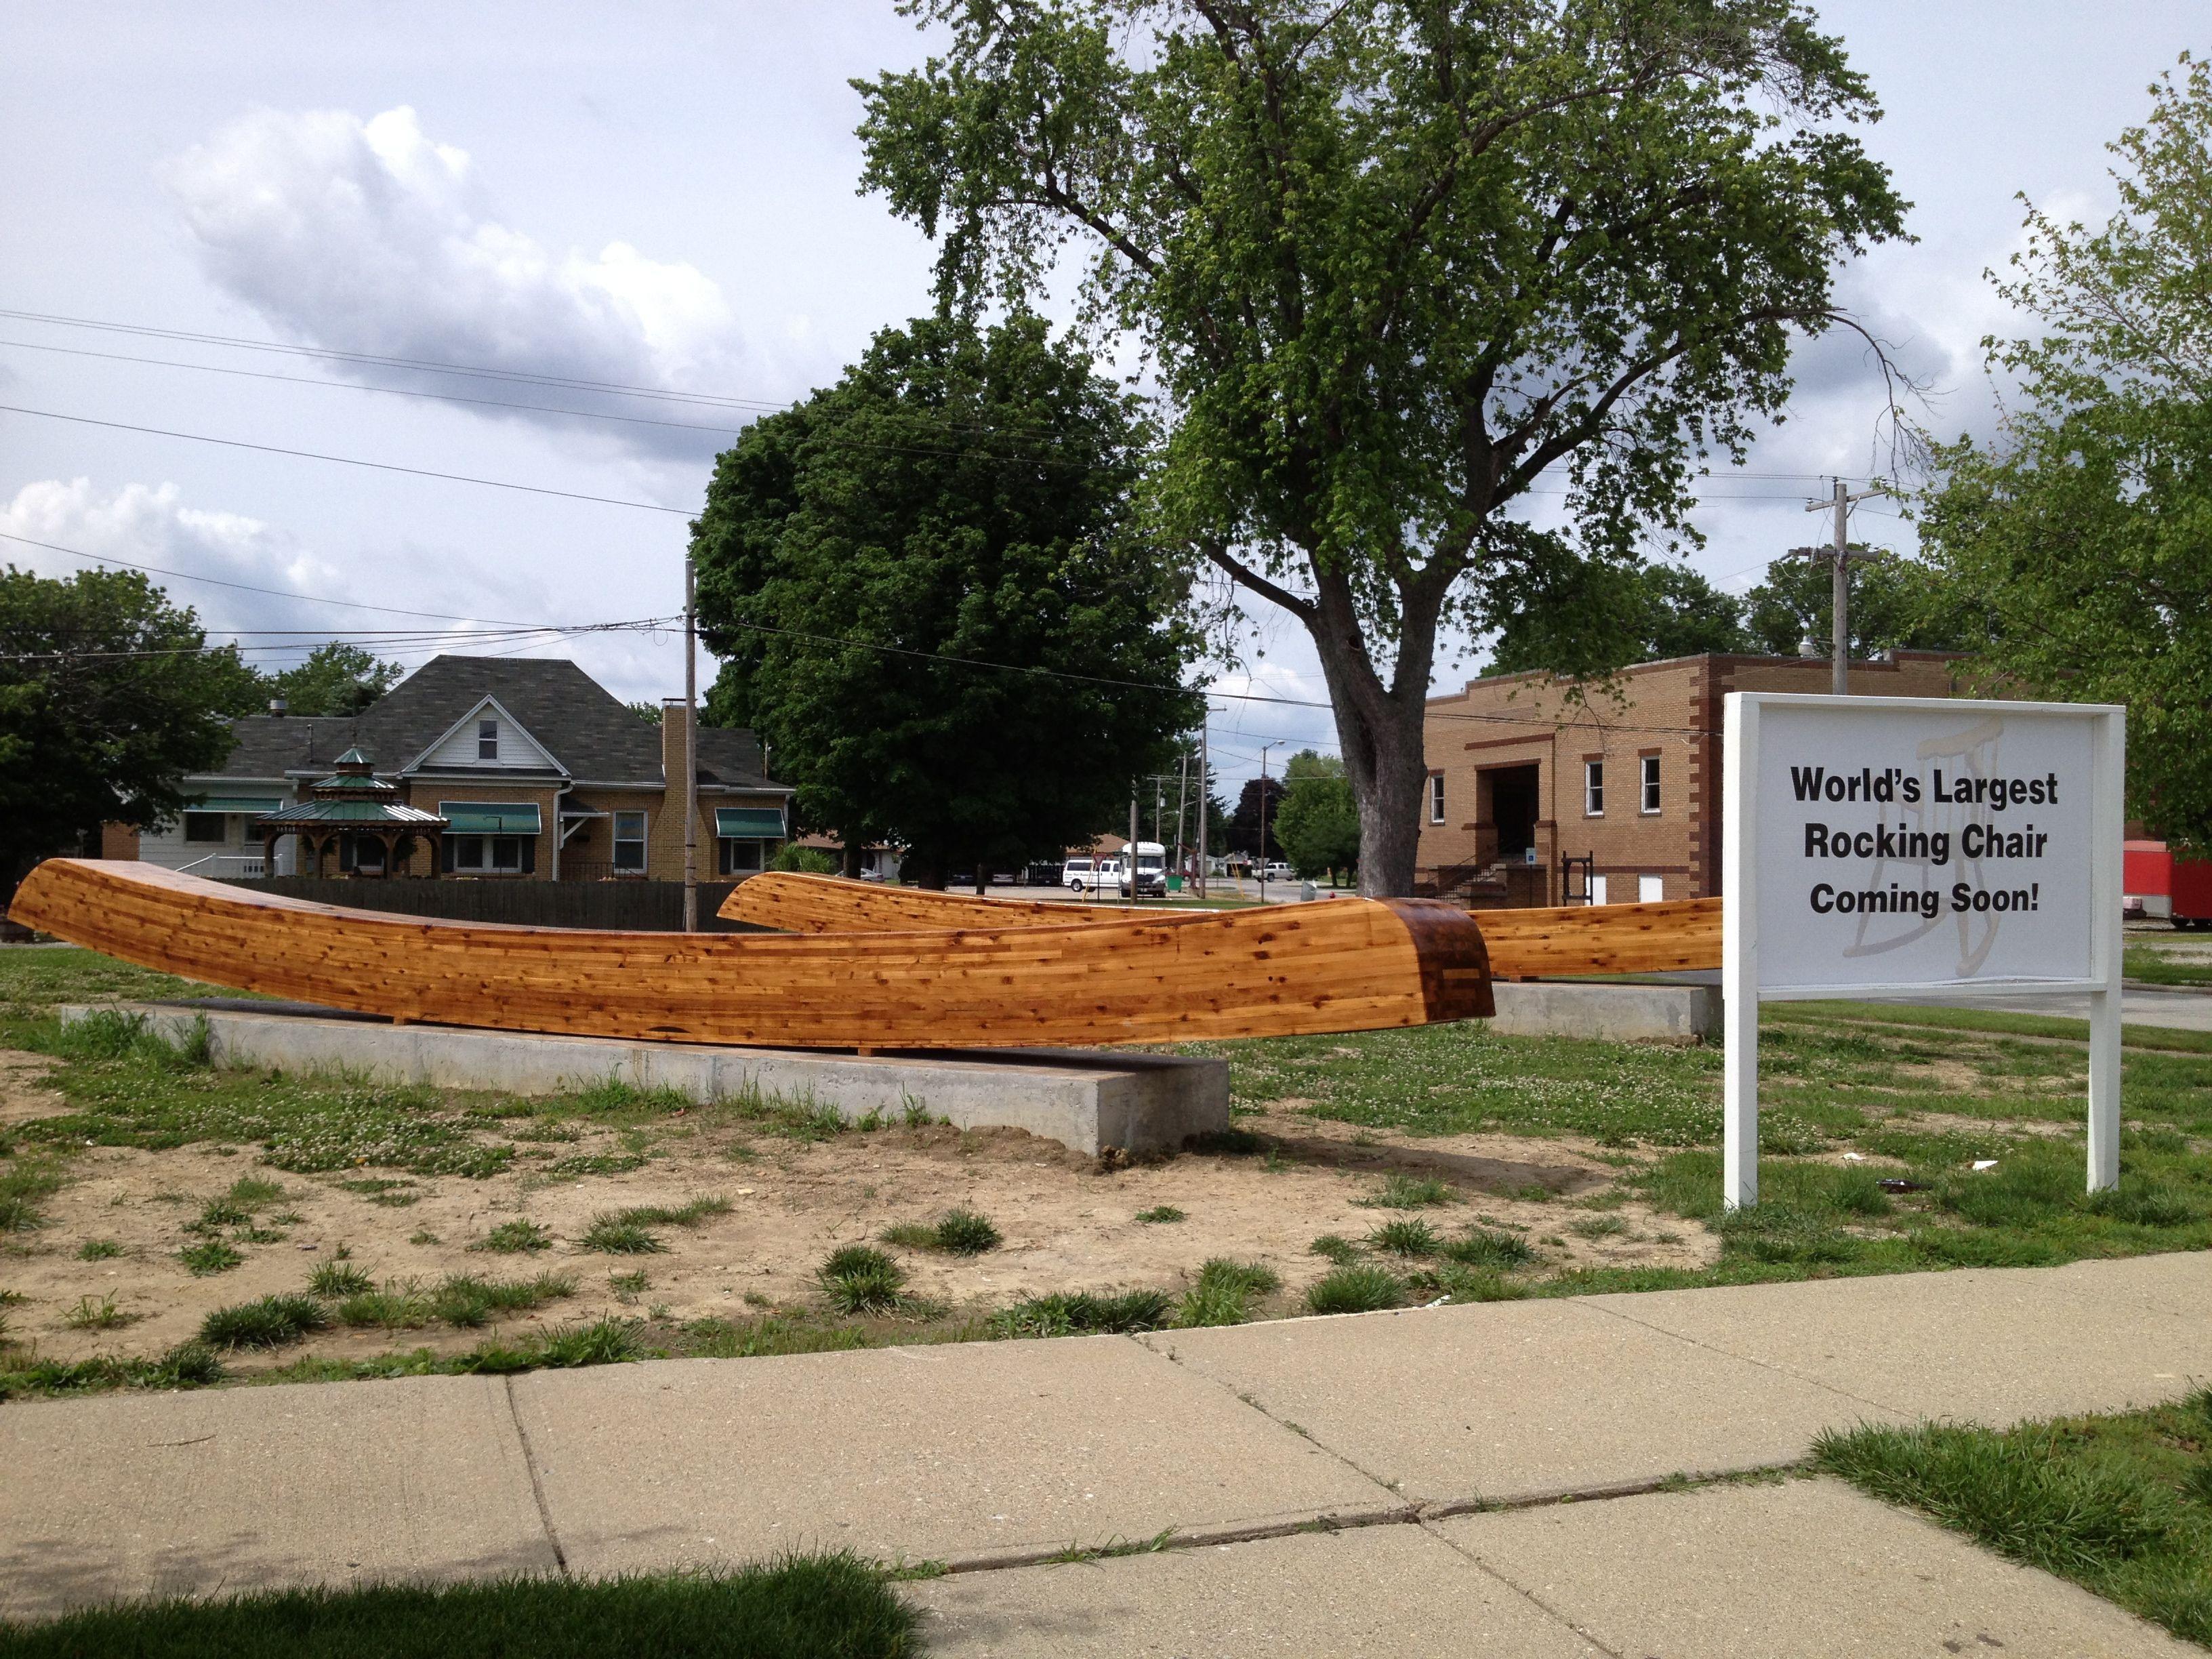 Illinois piatt county cisco - World S Largest Rocking Chair Under Construction Casey Illinois